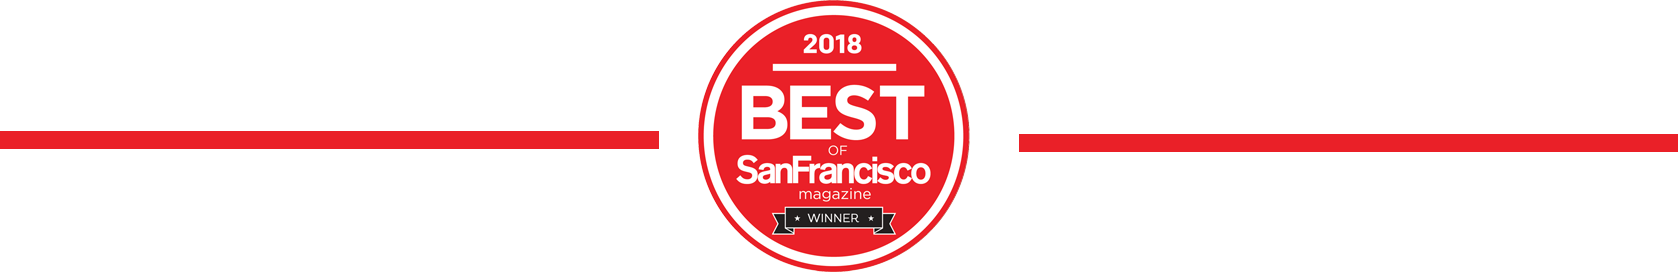 best of 2018 san francisco